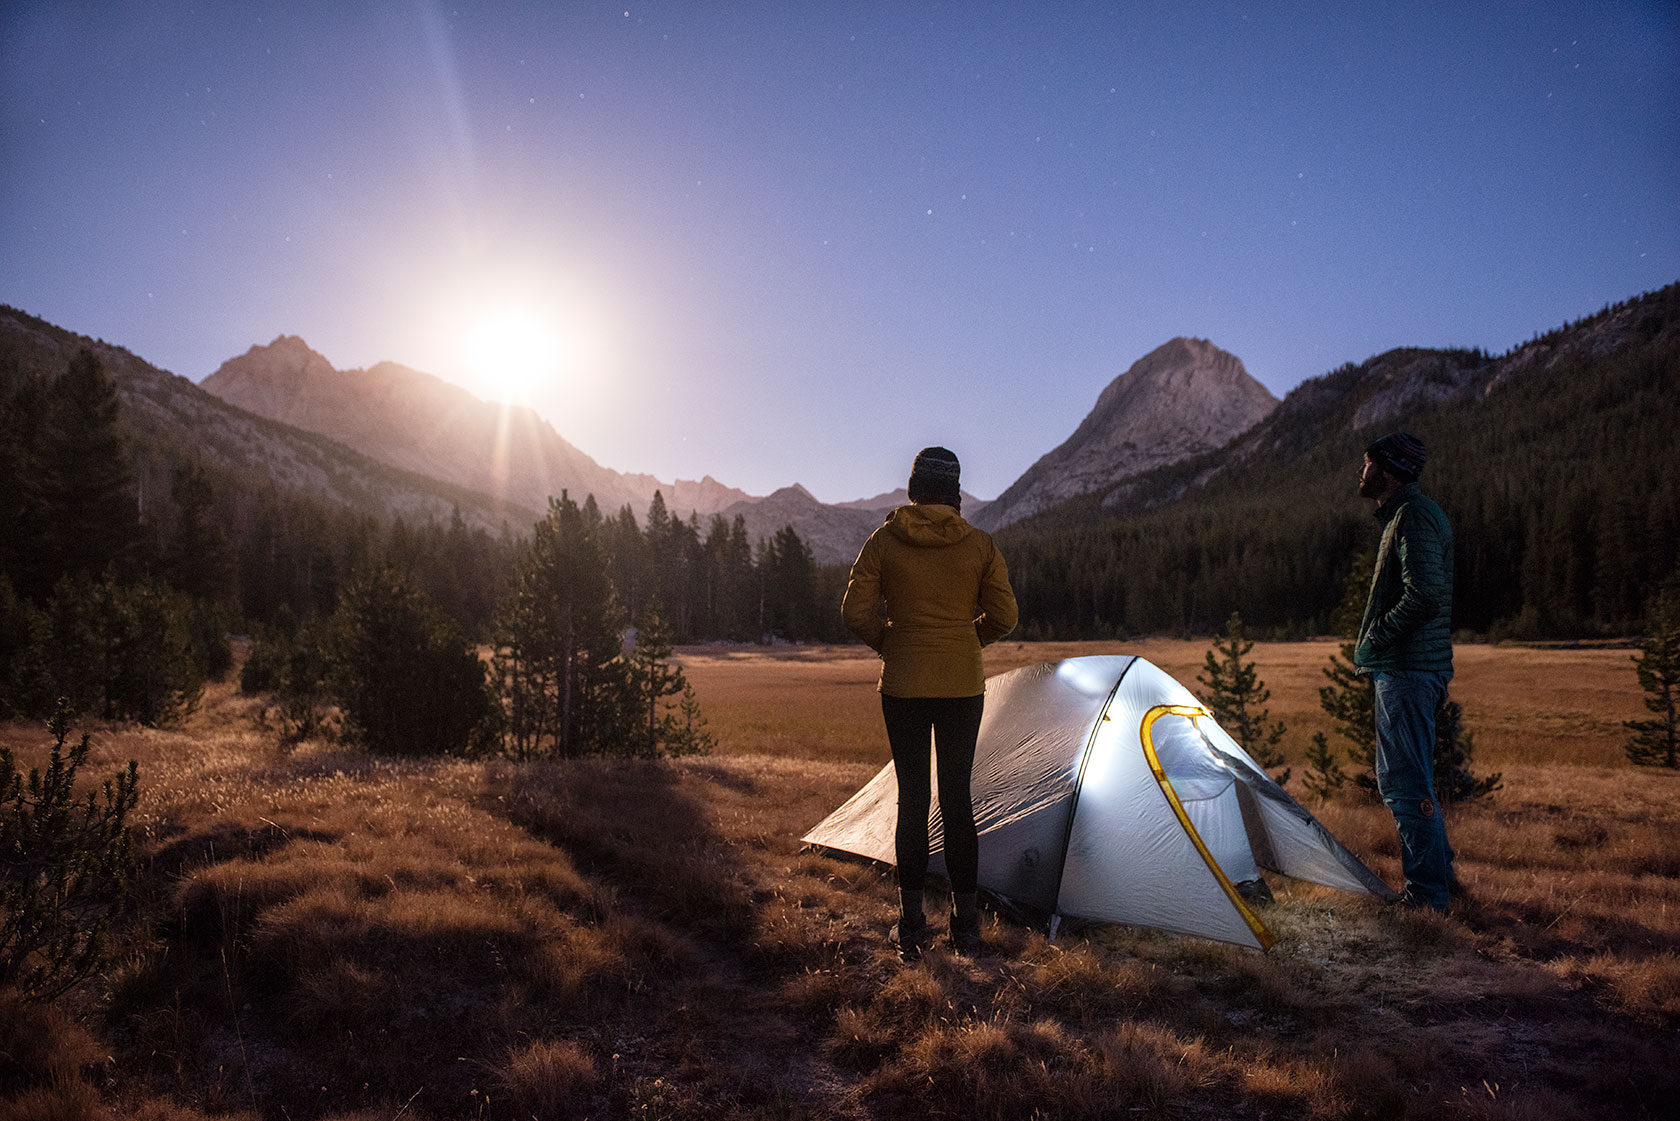 austin-trigg-big-agnes-tent-john-muir-trail-camping-meadow-night-Full-Moonrise-Evolution-Valley.jpg